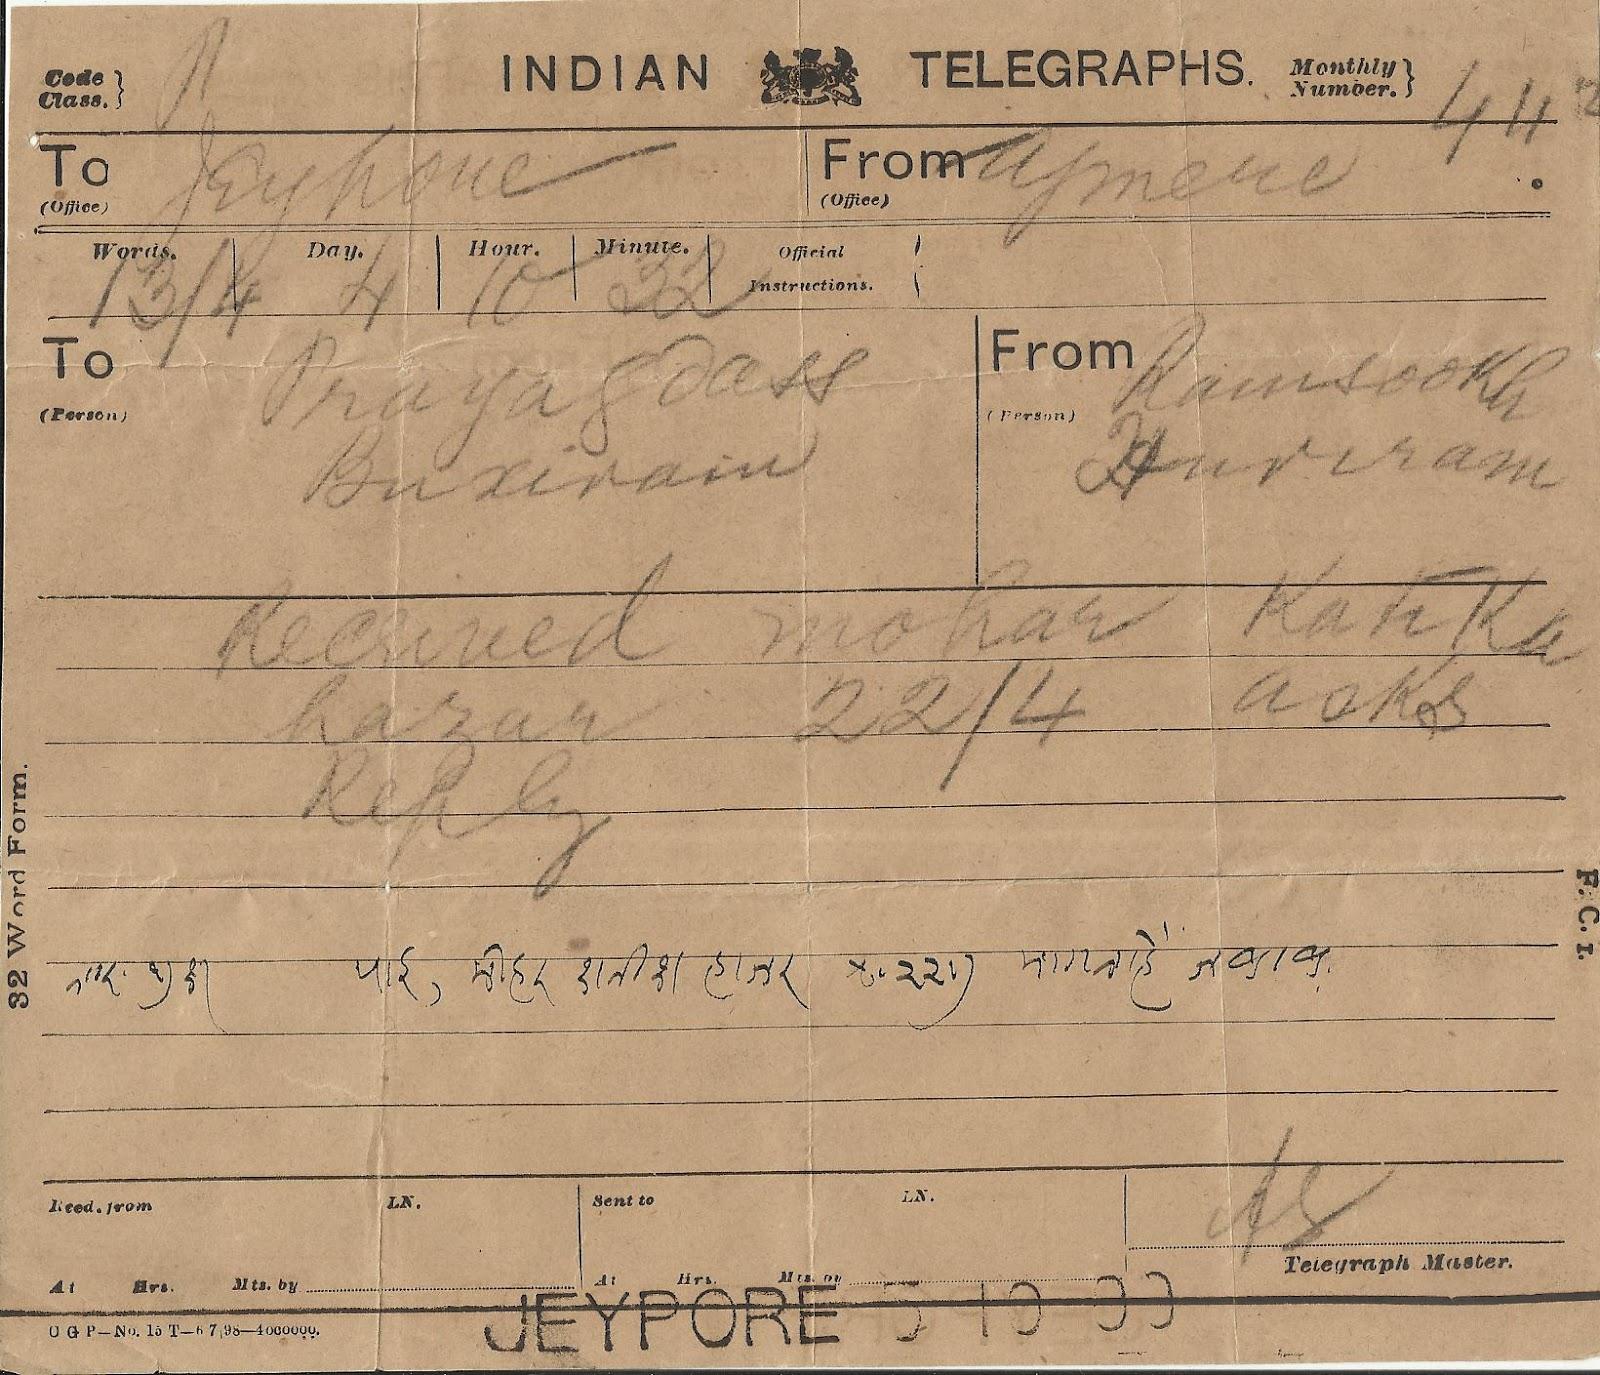 Pre Independence period telegram